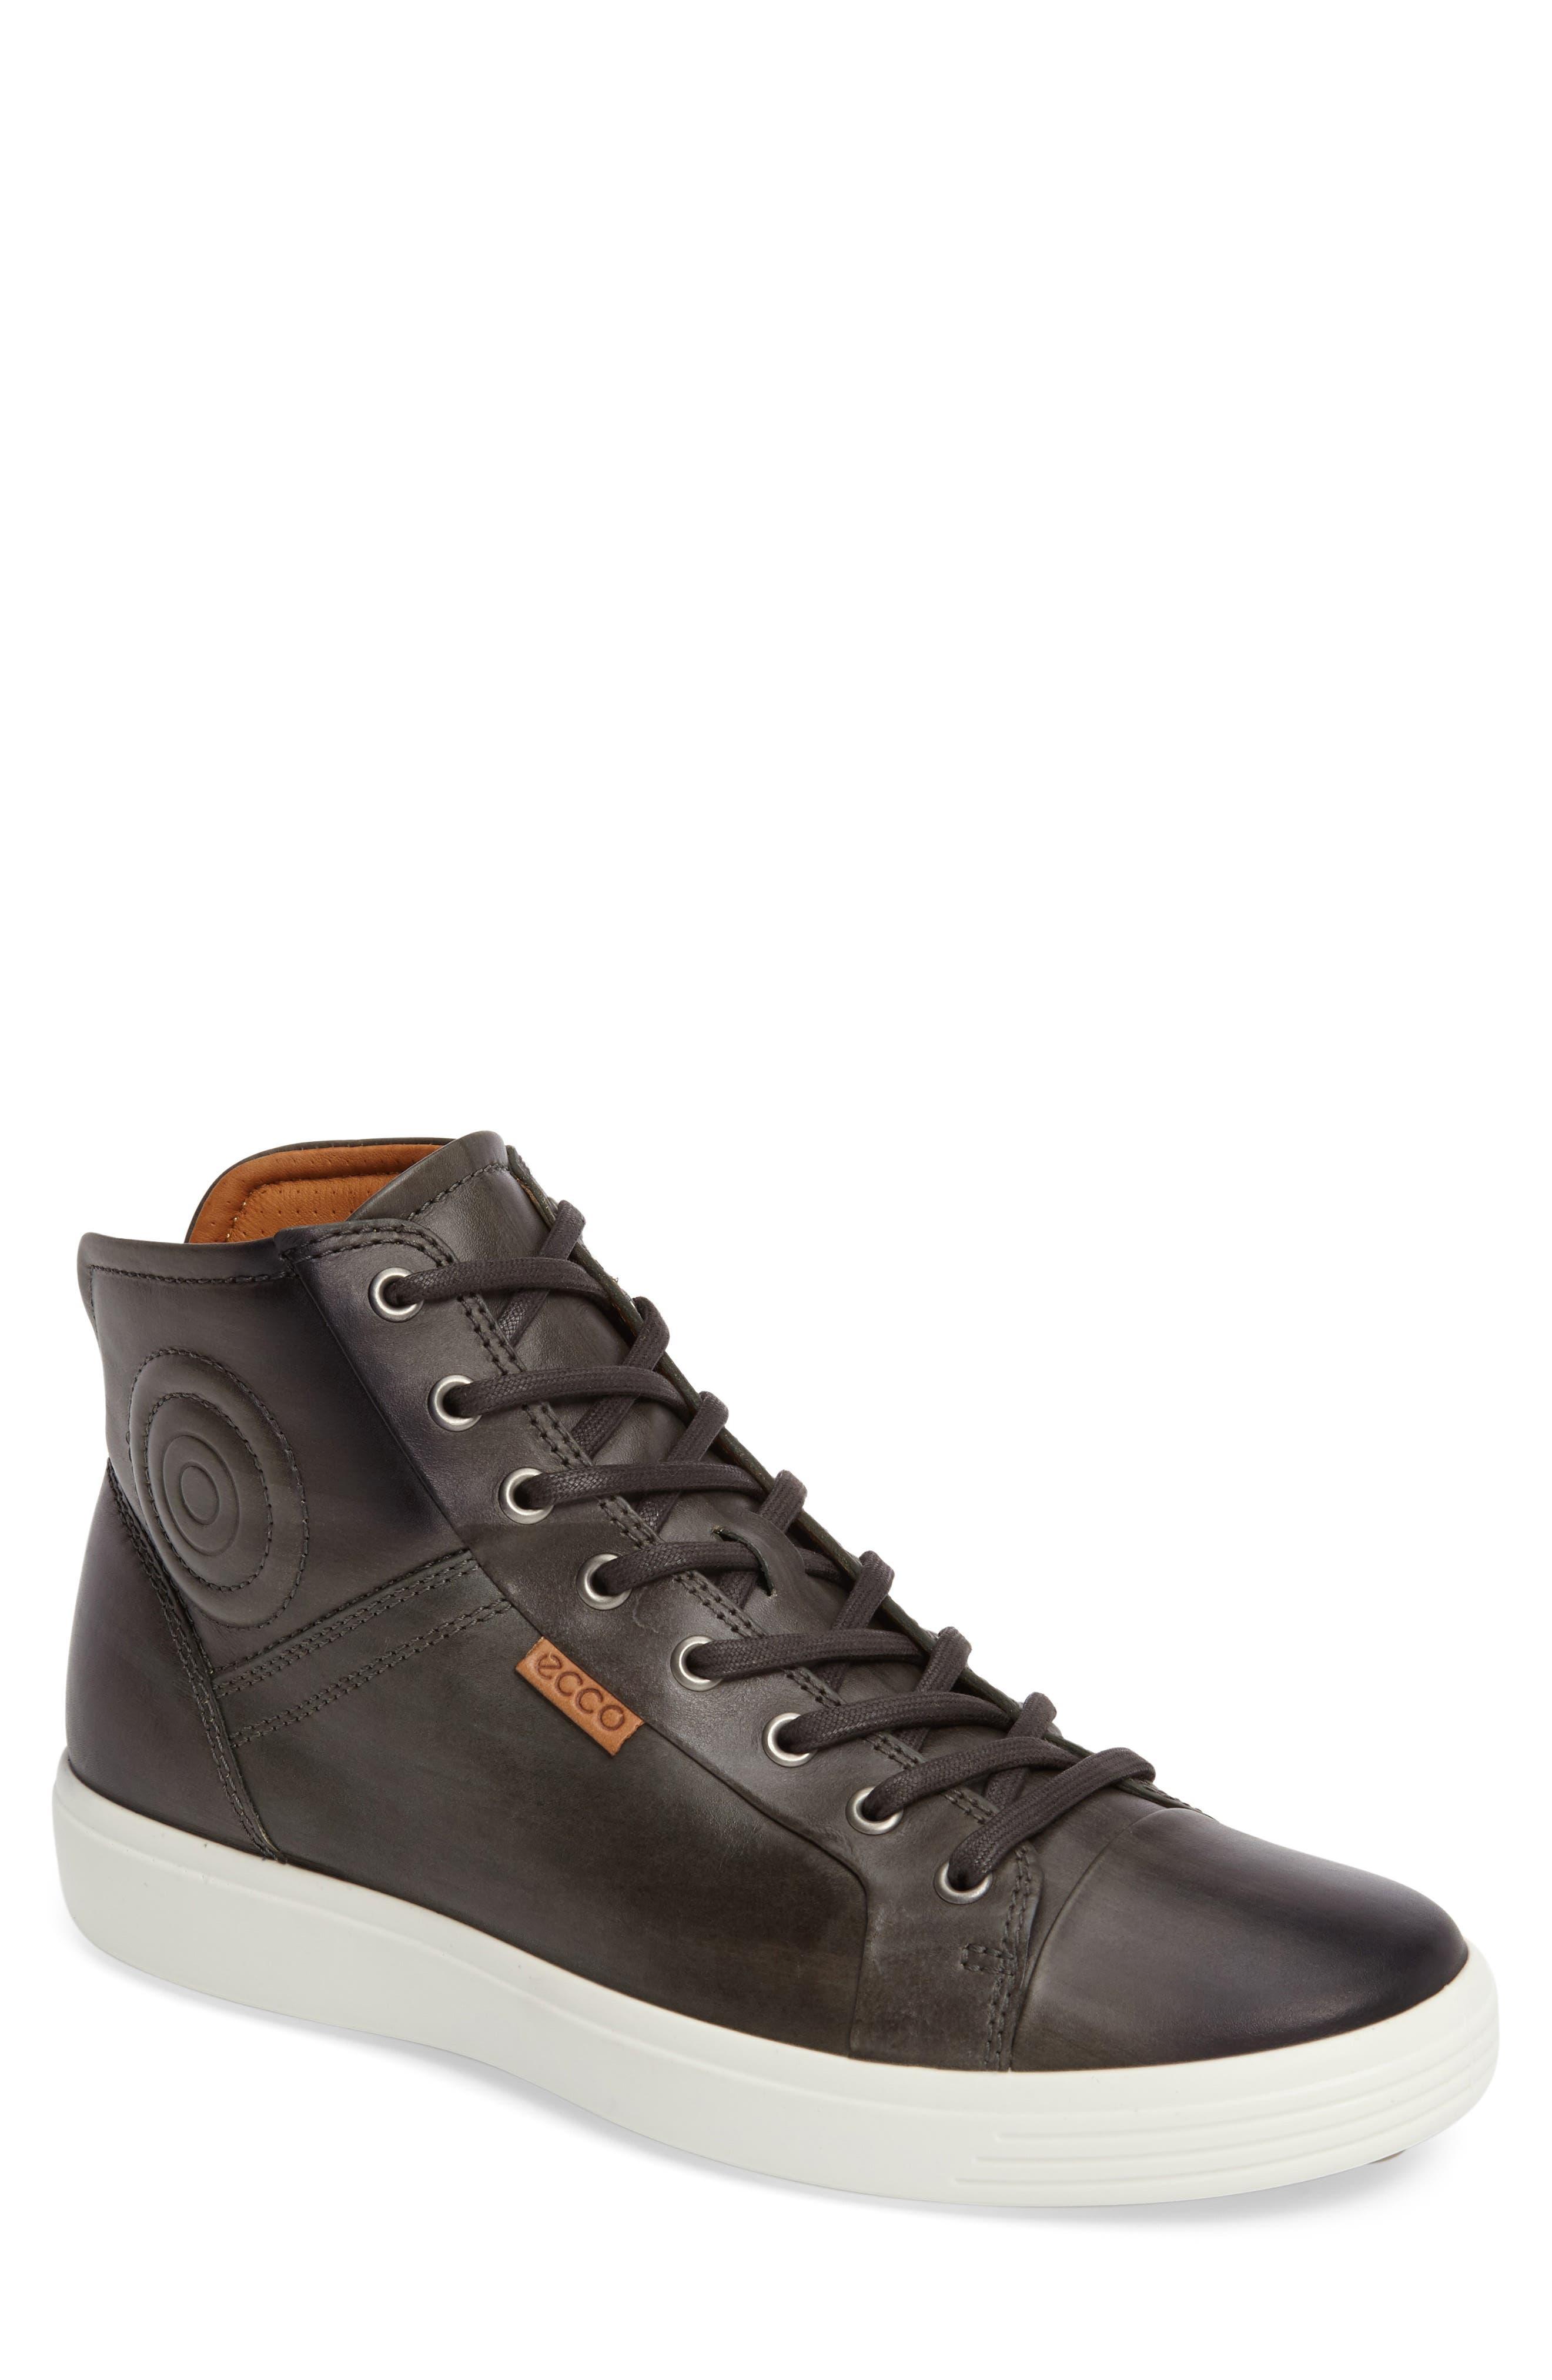 Main Image - ECCO Soft 7 High Top Sneaker (Men)